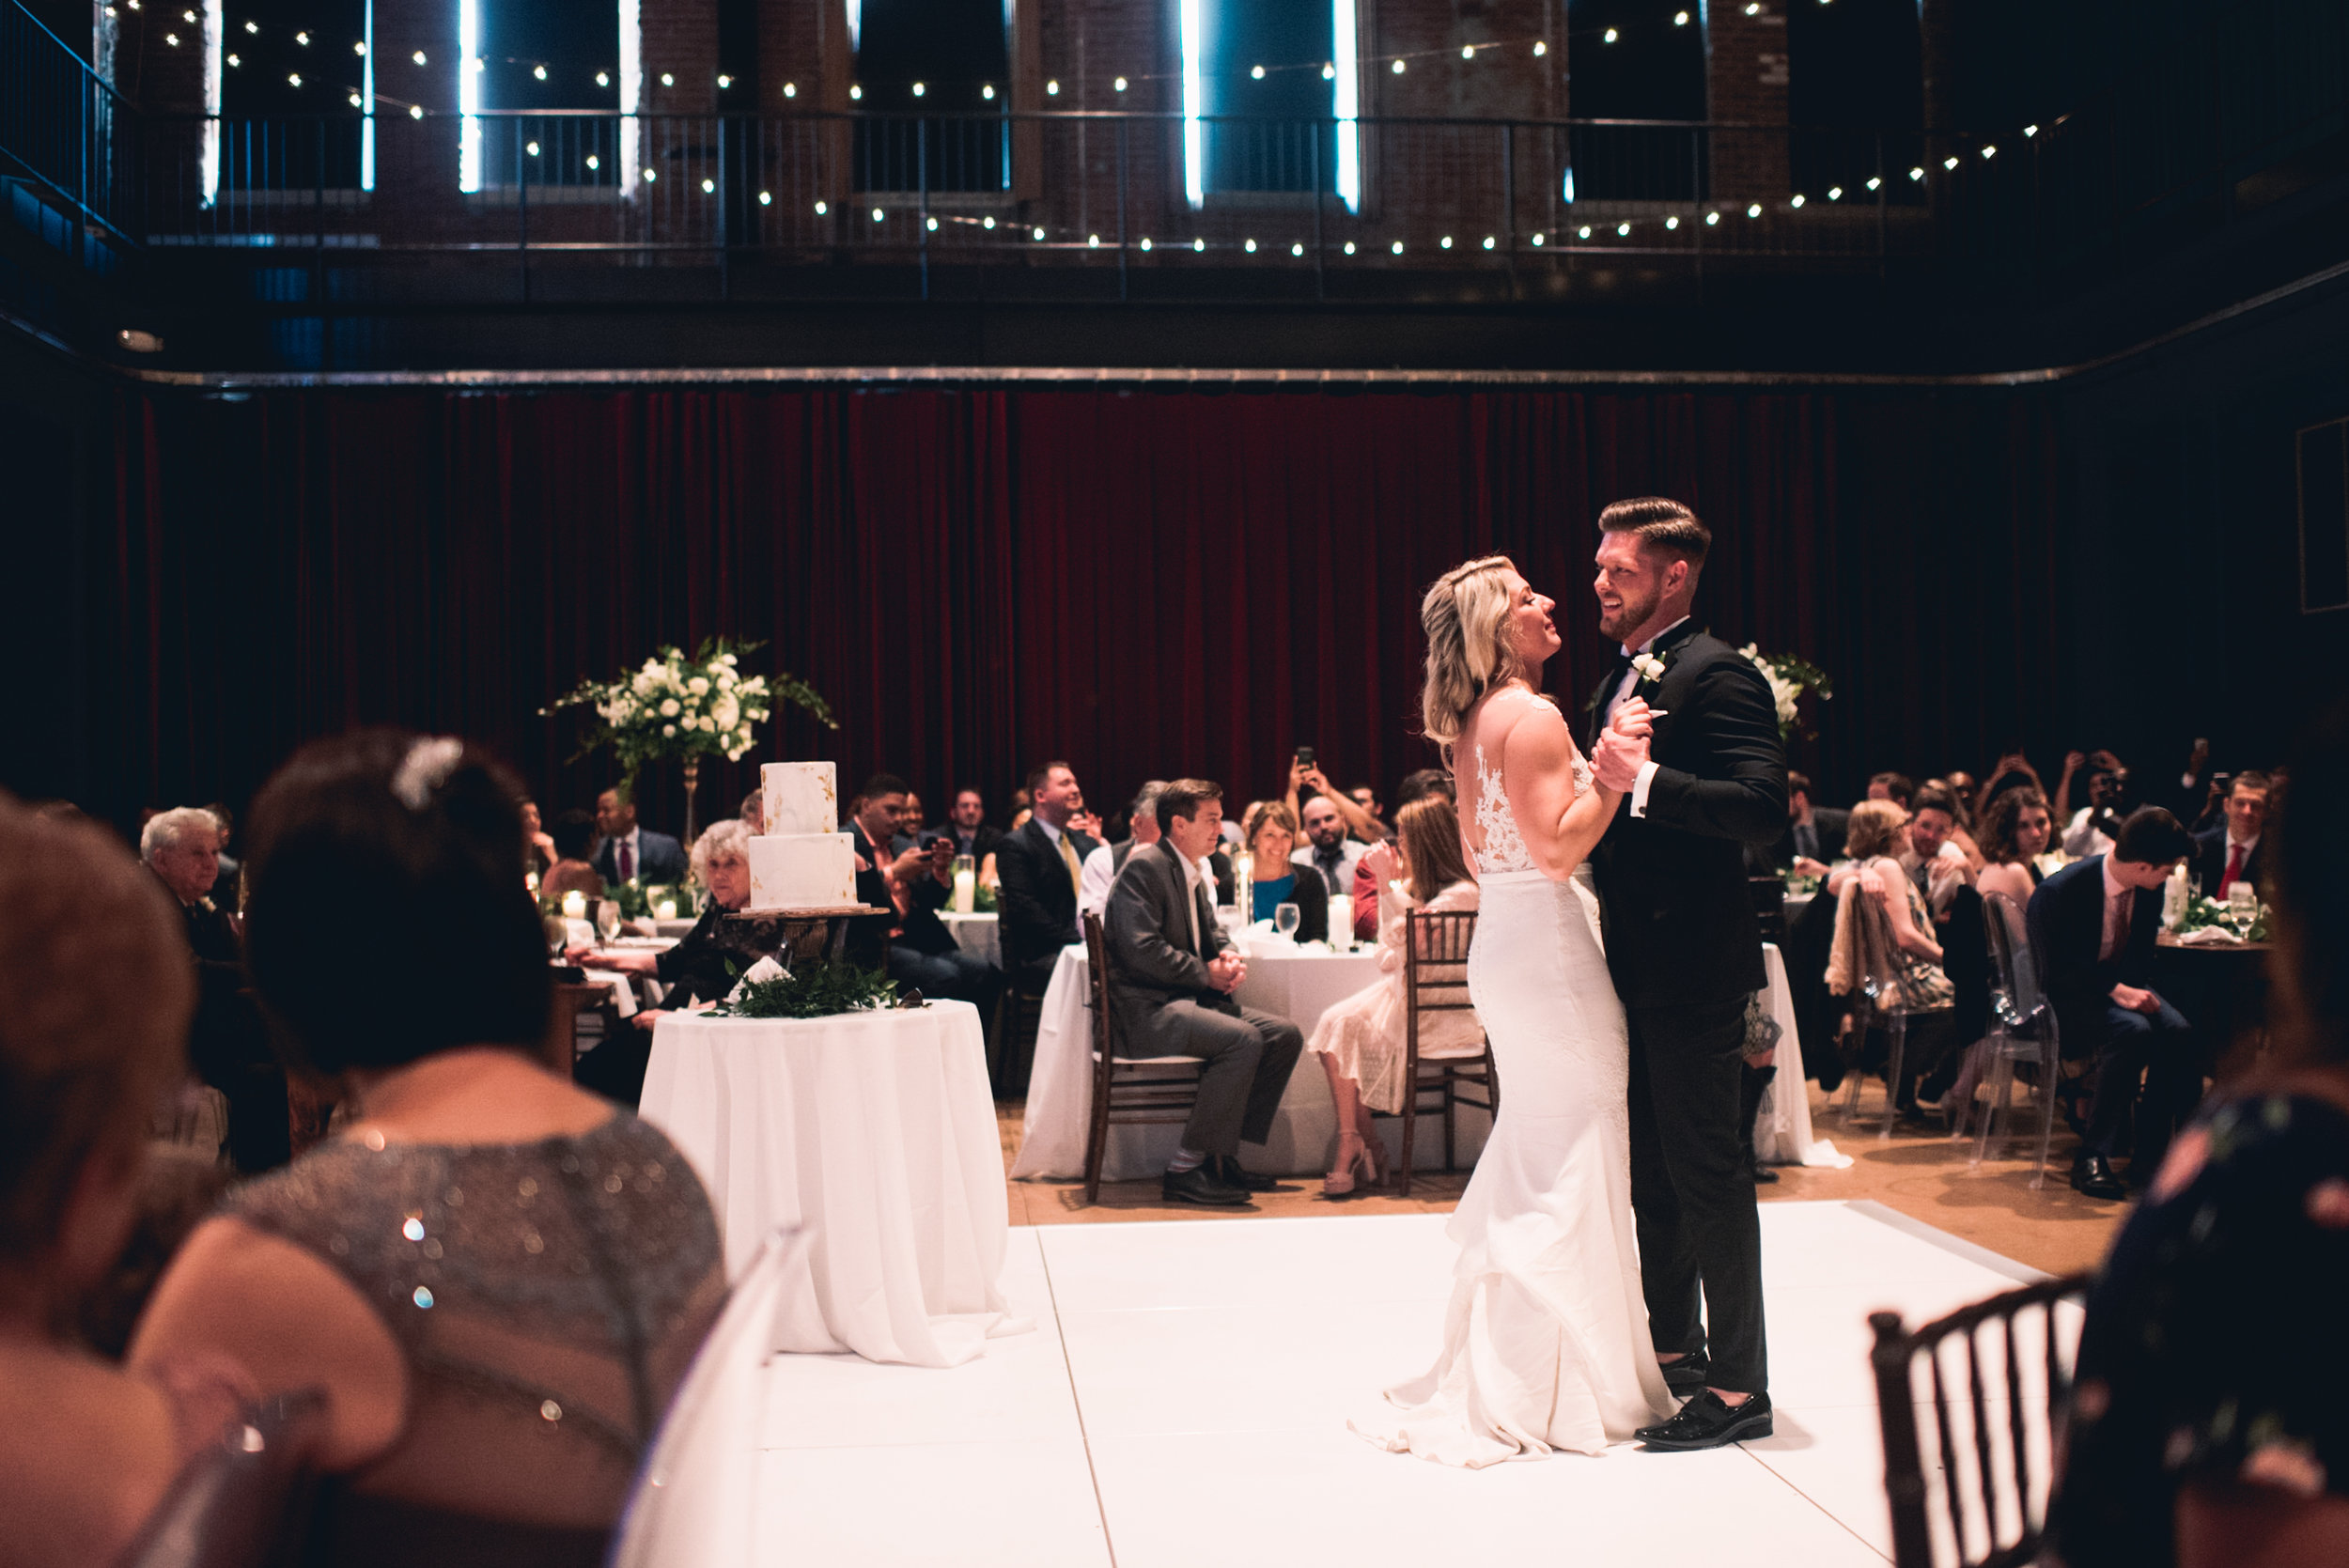 Pittsburgh Pennsylvania New York NYC Wedding Photographer Photojournalist Luxury Downtown Opera - Stirpe 1320.jpg